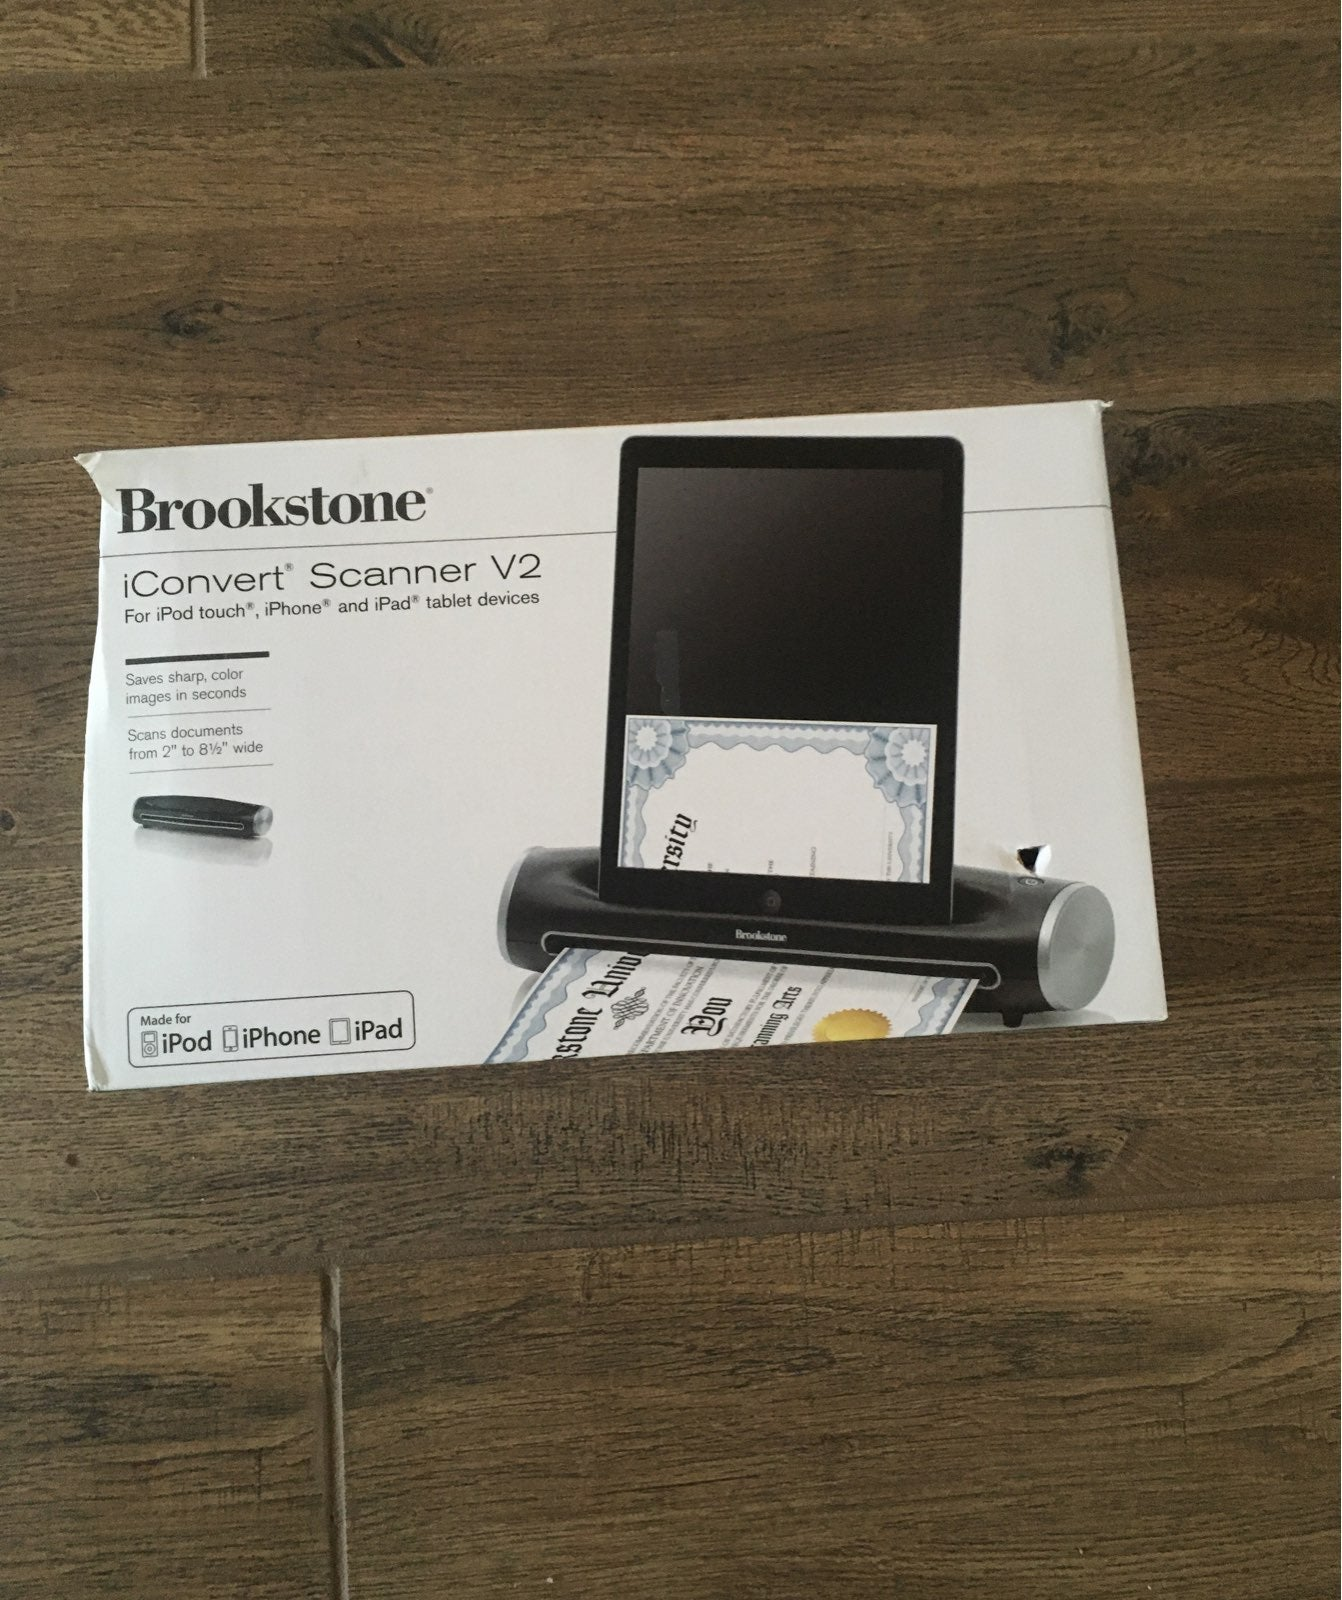 Brookstone iConvert Scanner v2